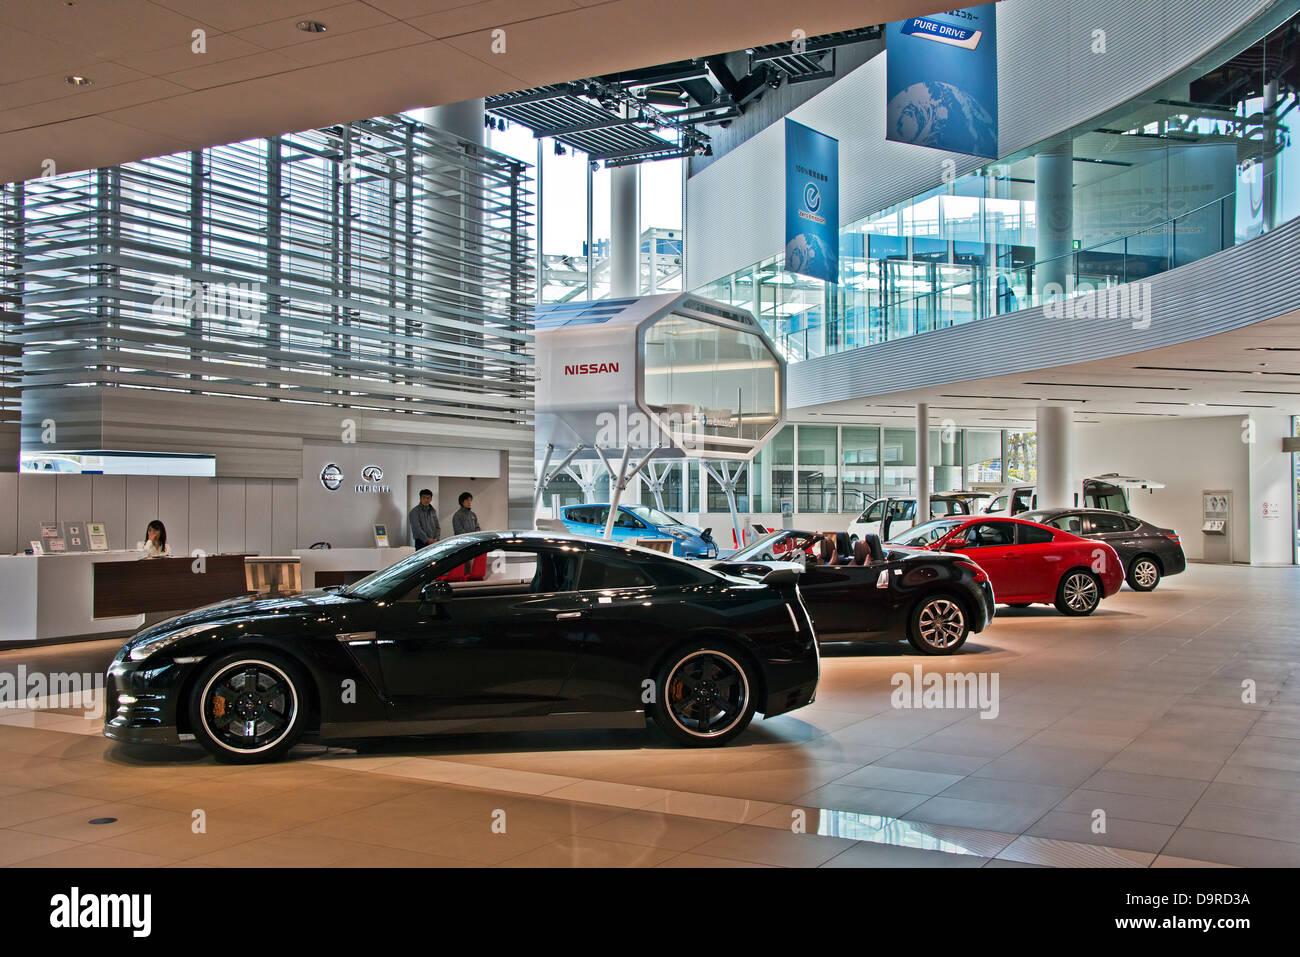 Nissan Gallery, Yokohama, Japan - Stock Image